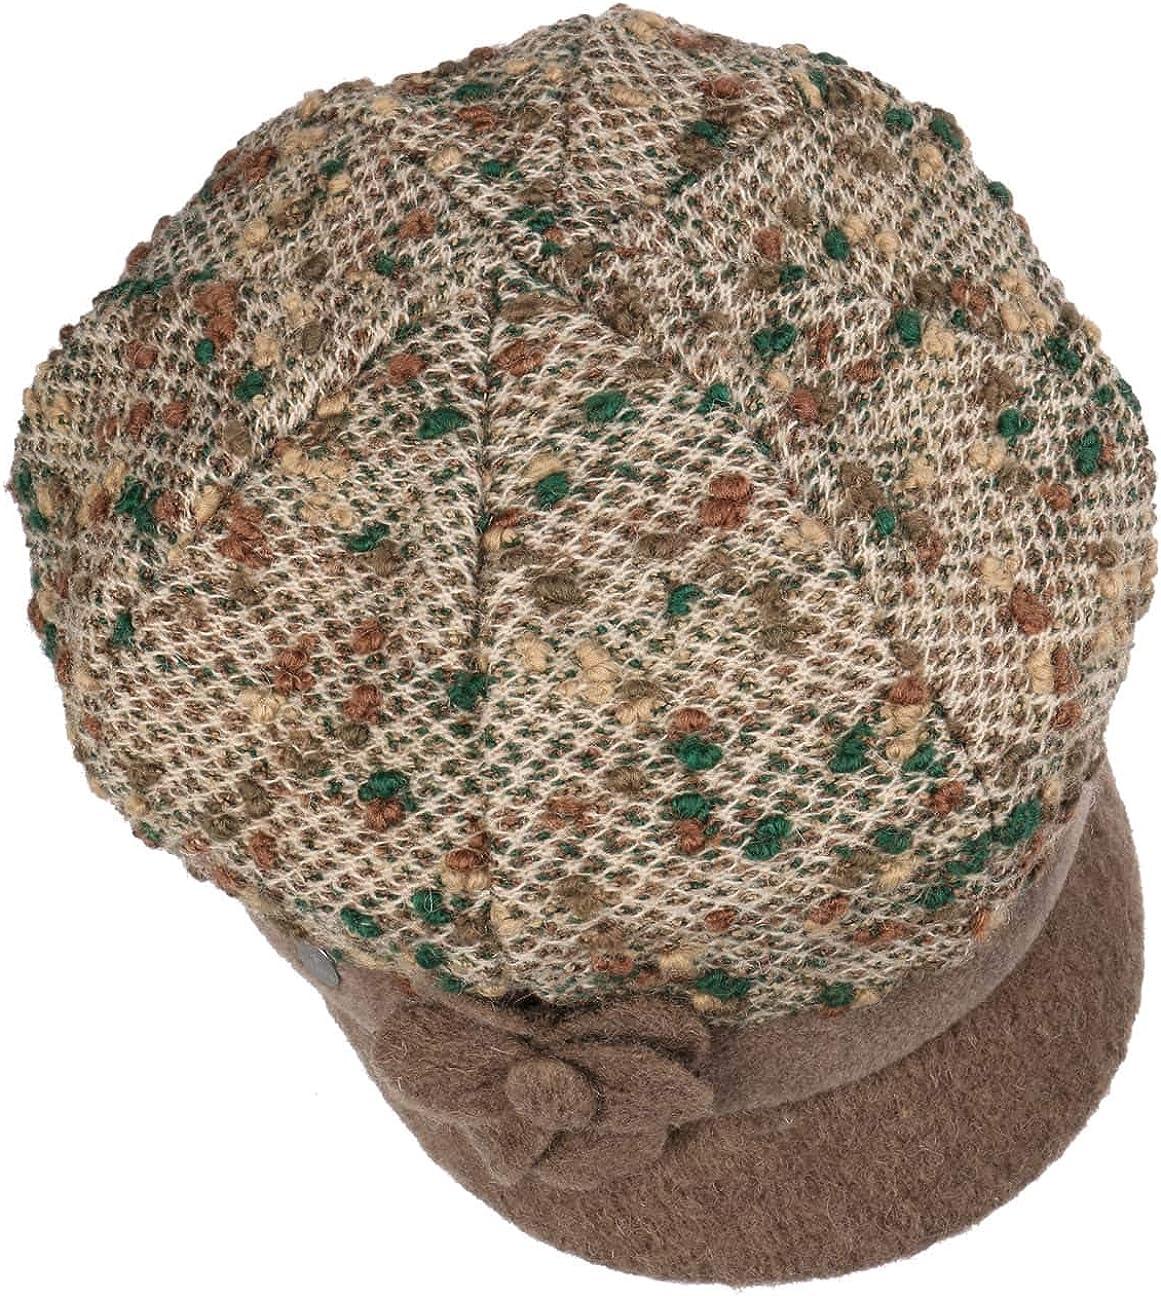 Made in Italy mit Schirm Lierys Levanja Schildm/ütze Damencap Wintercap Schirmm/ütze Damen Schirm Herbst-Winter